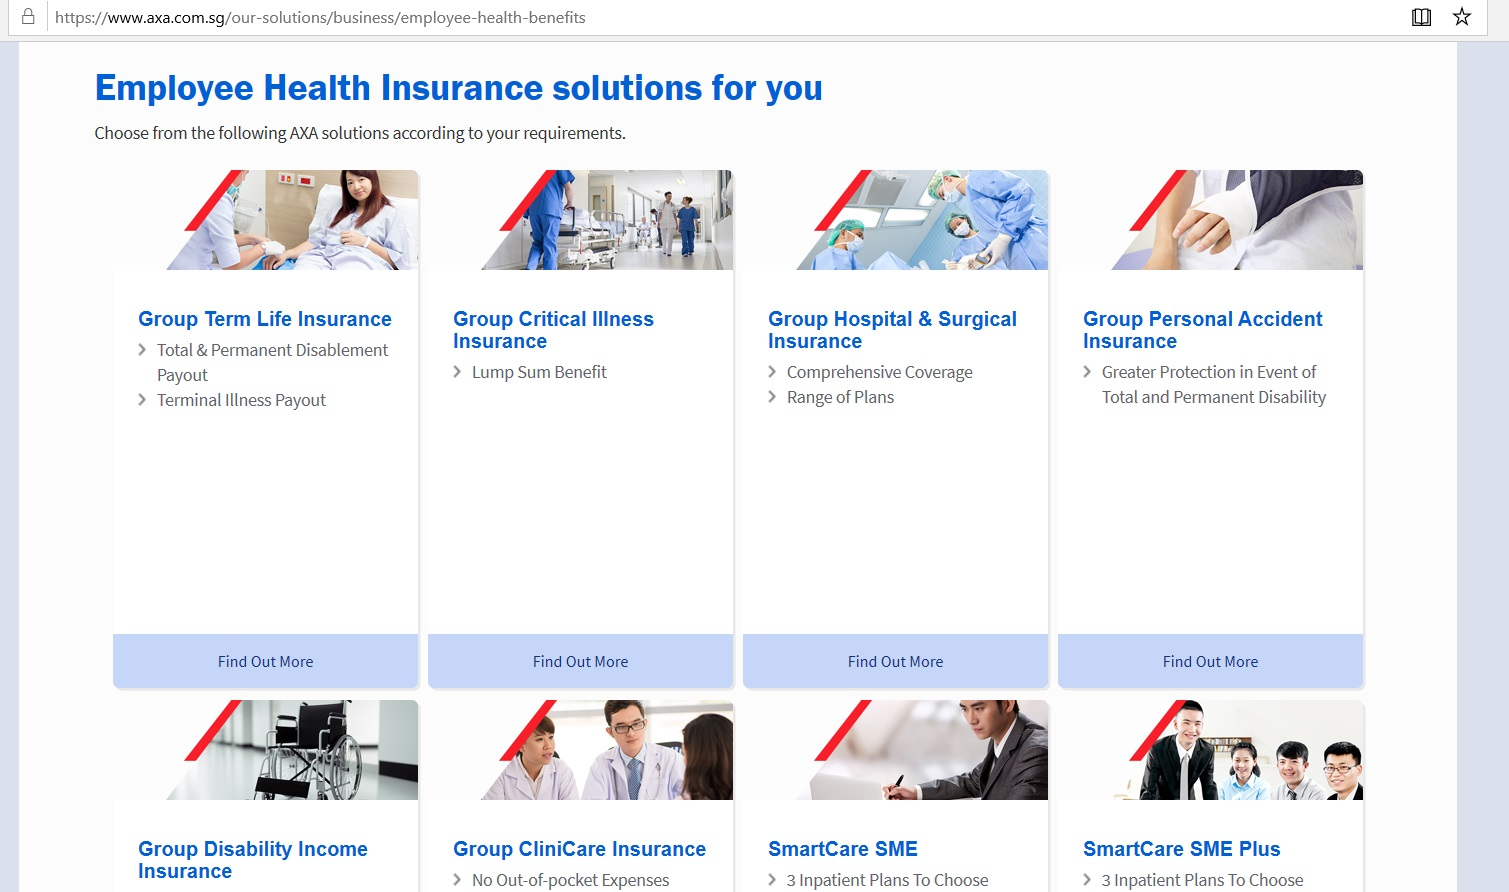 Listings for insurance plans from AXA Insurance.